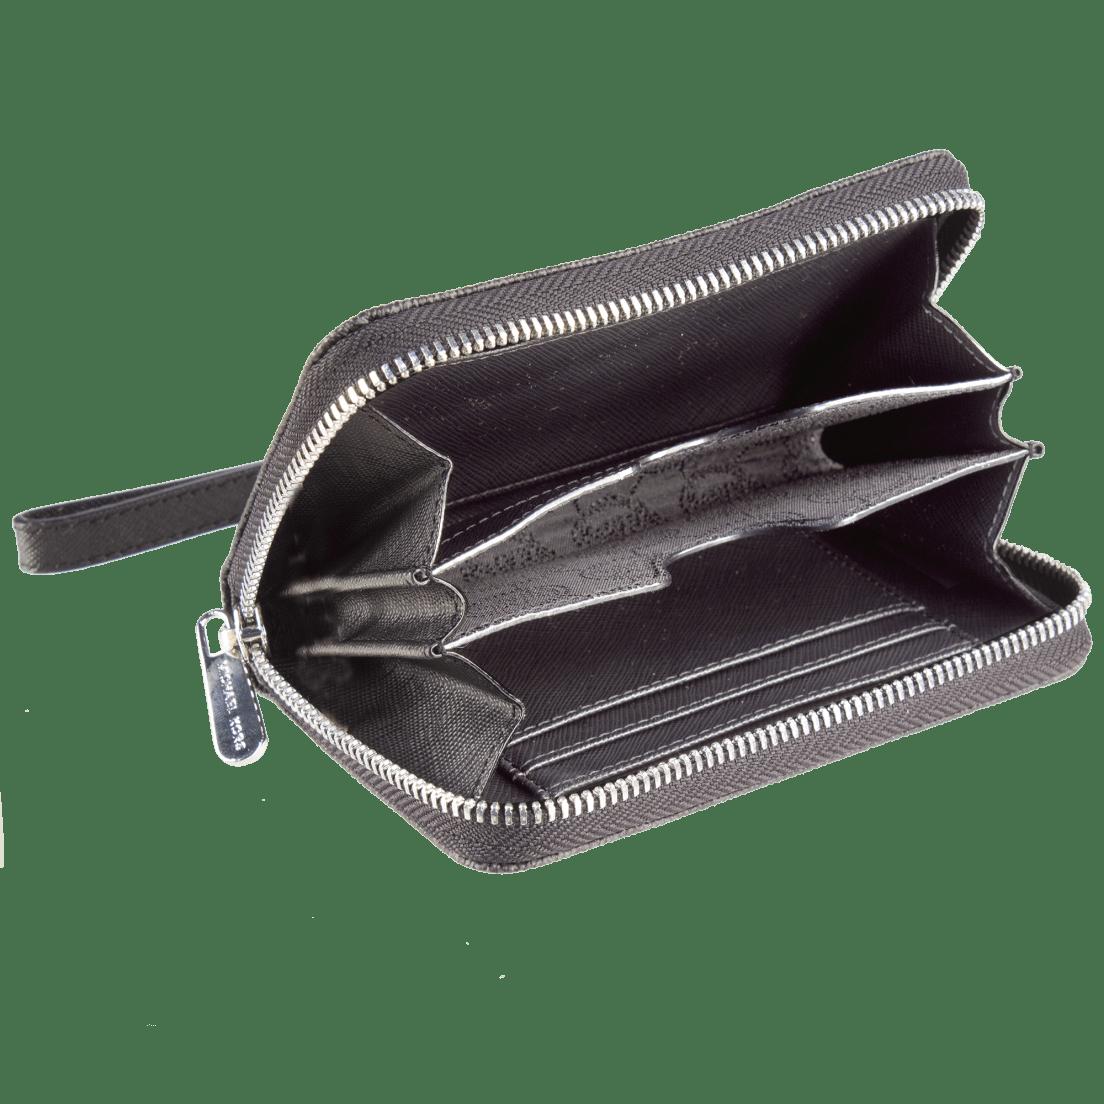 1f7d132924b0 ... Michael Kors Essential Zip Wallet Gray Monogram. Too late